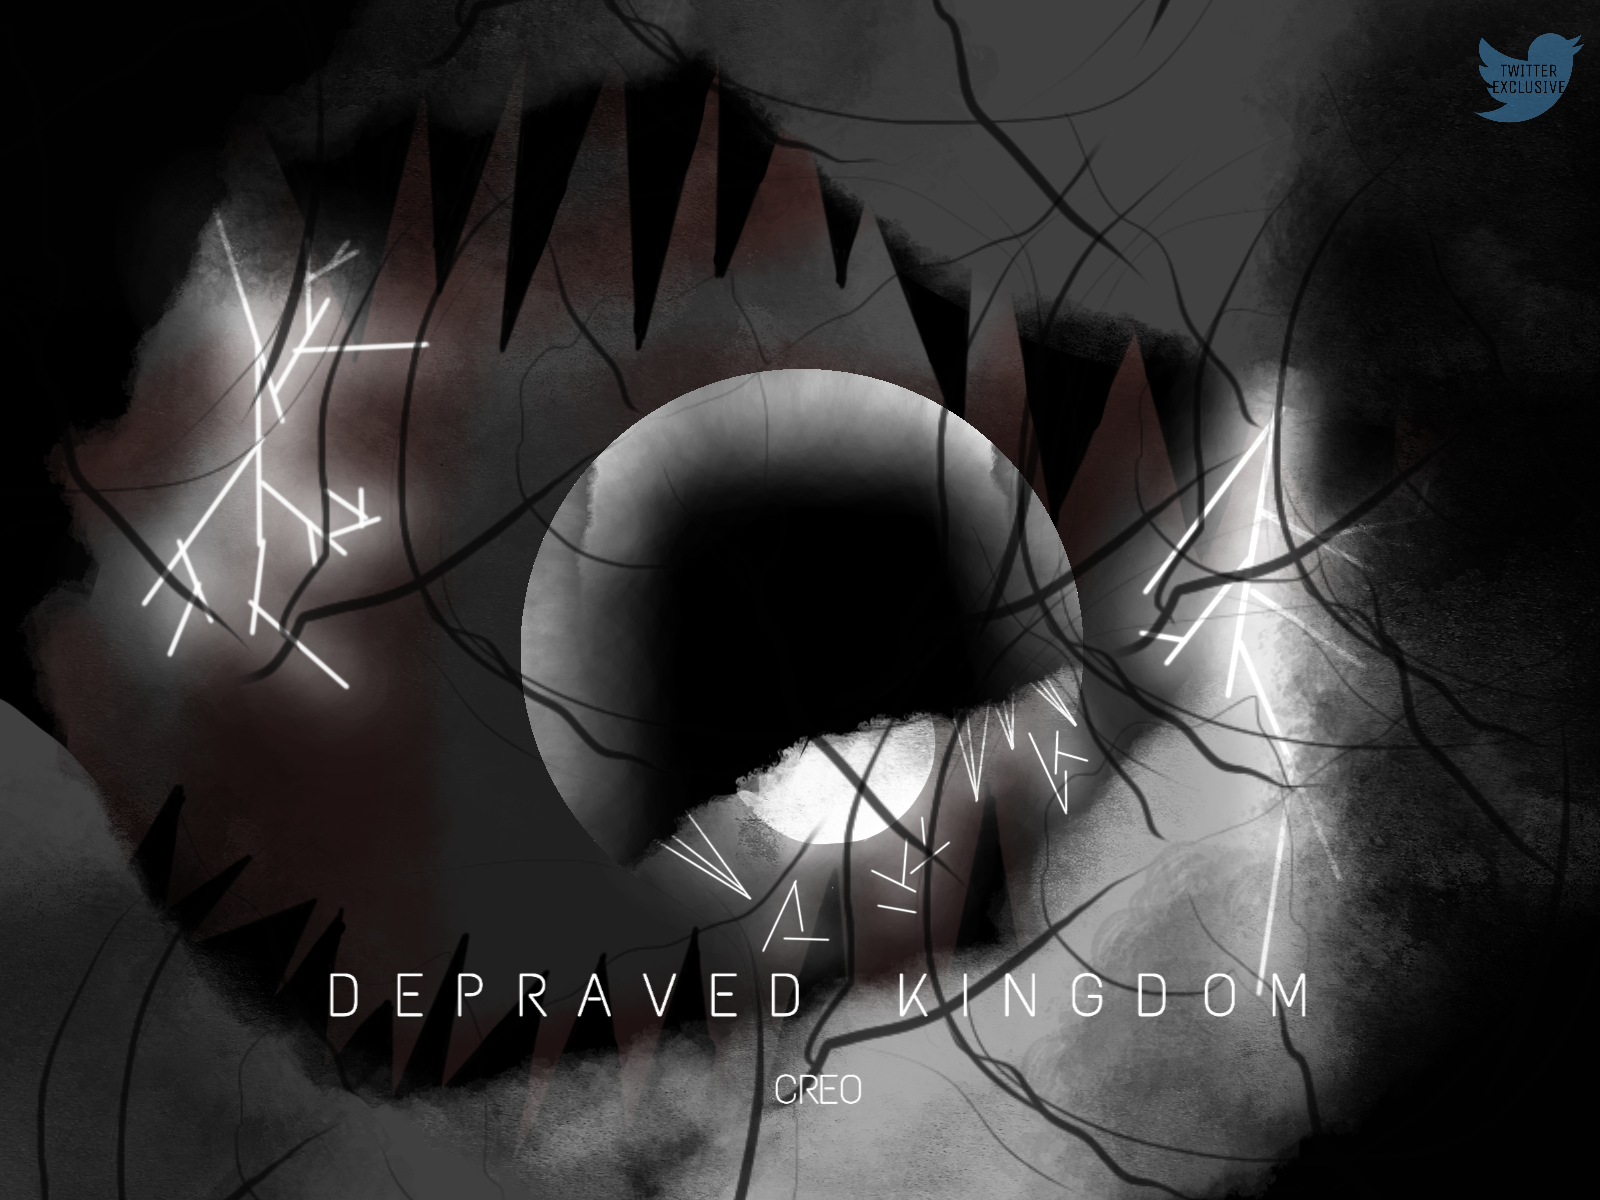 Creo - Depraved Kingdom